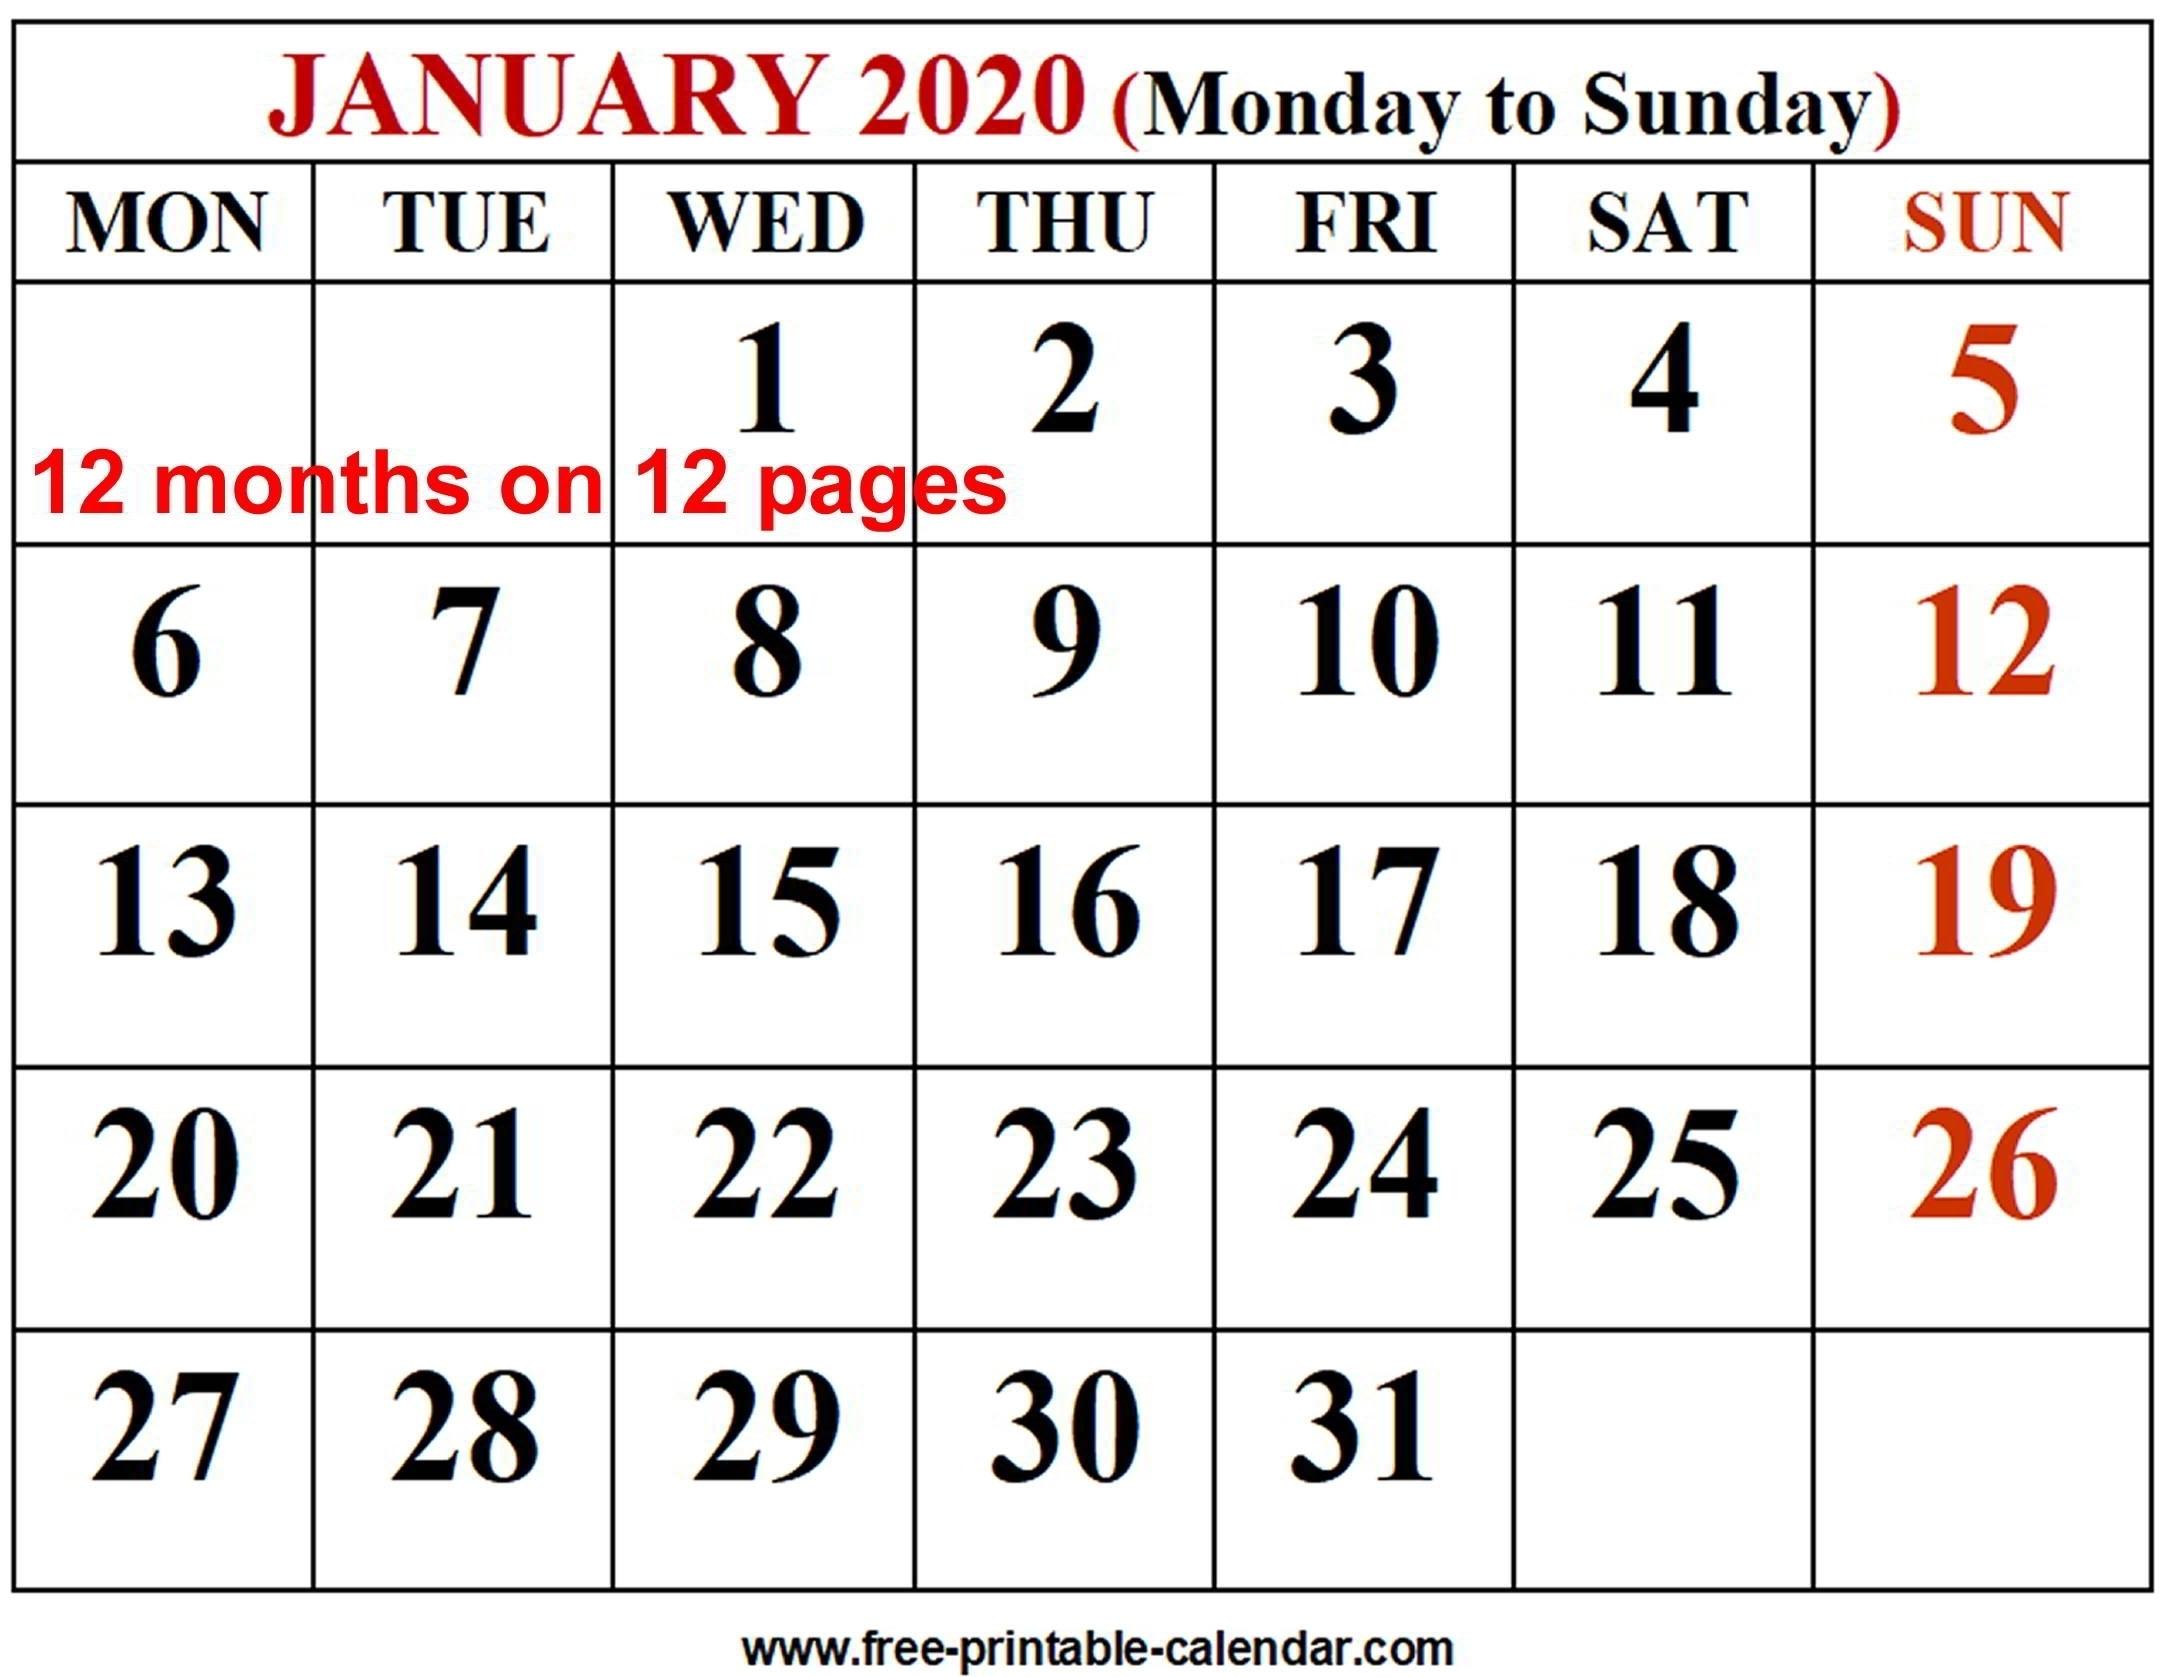 Free Printable 3 Month Calendar 2020 – Urgup.ewrs2018